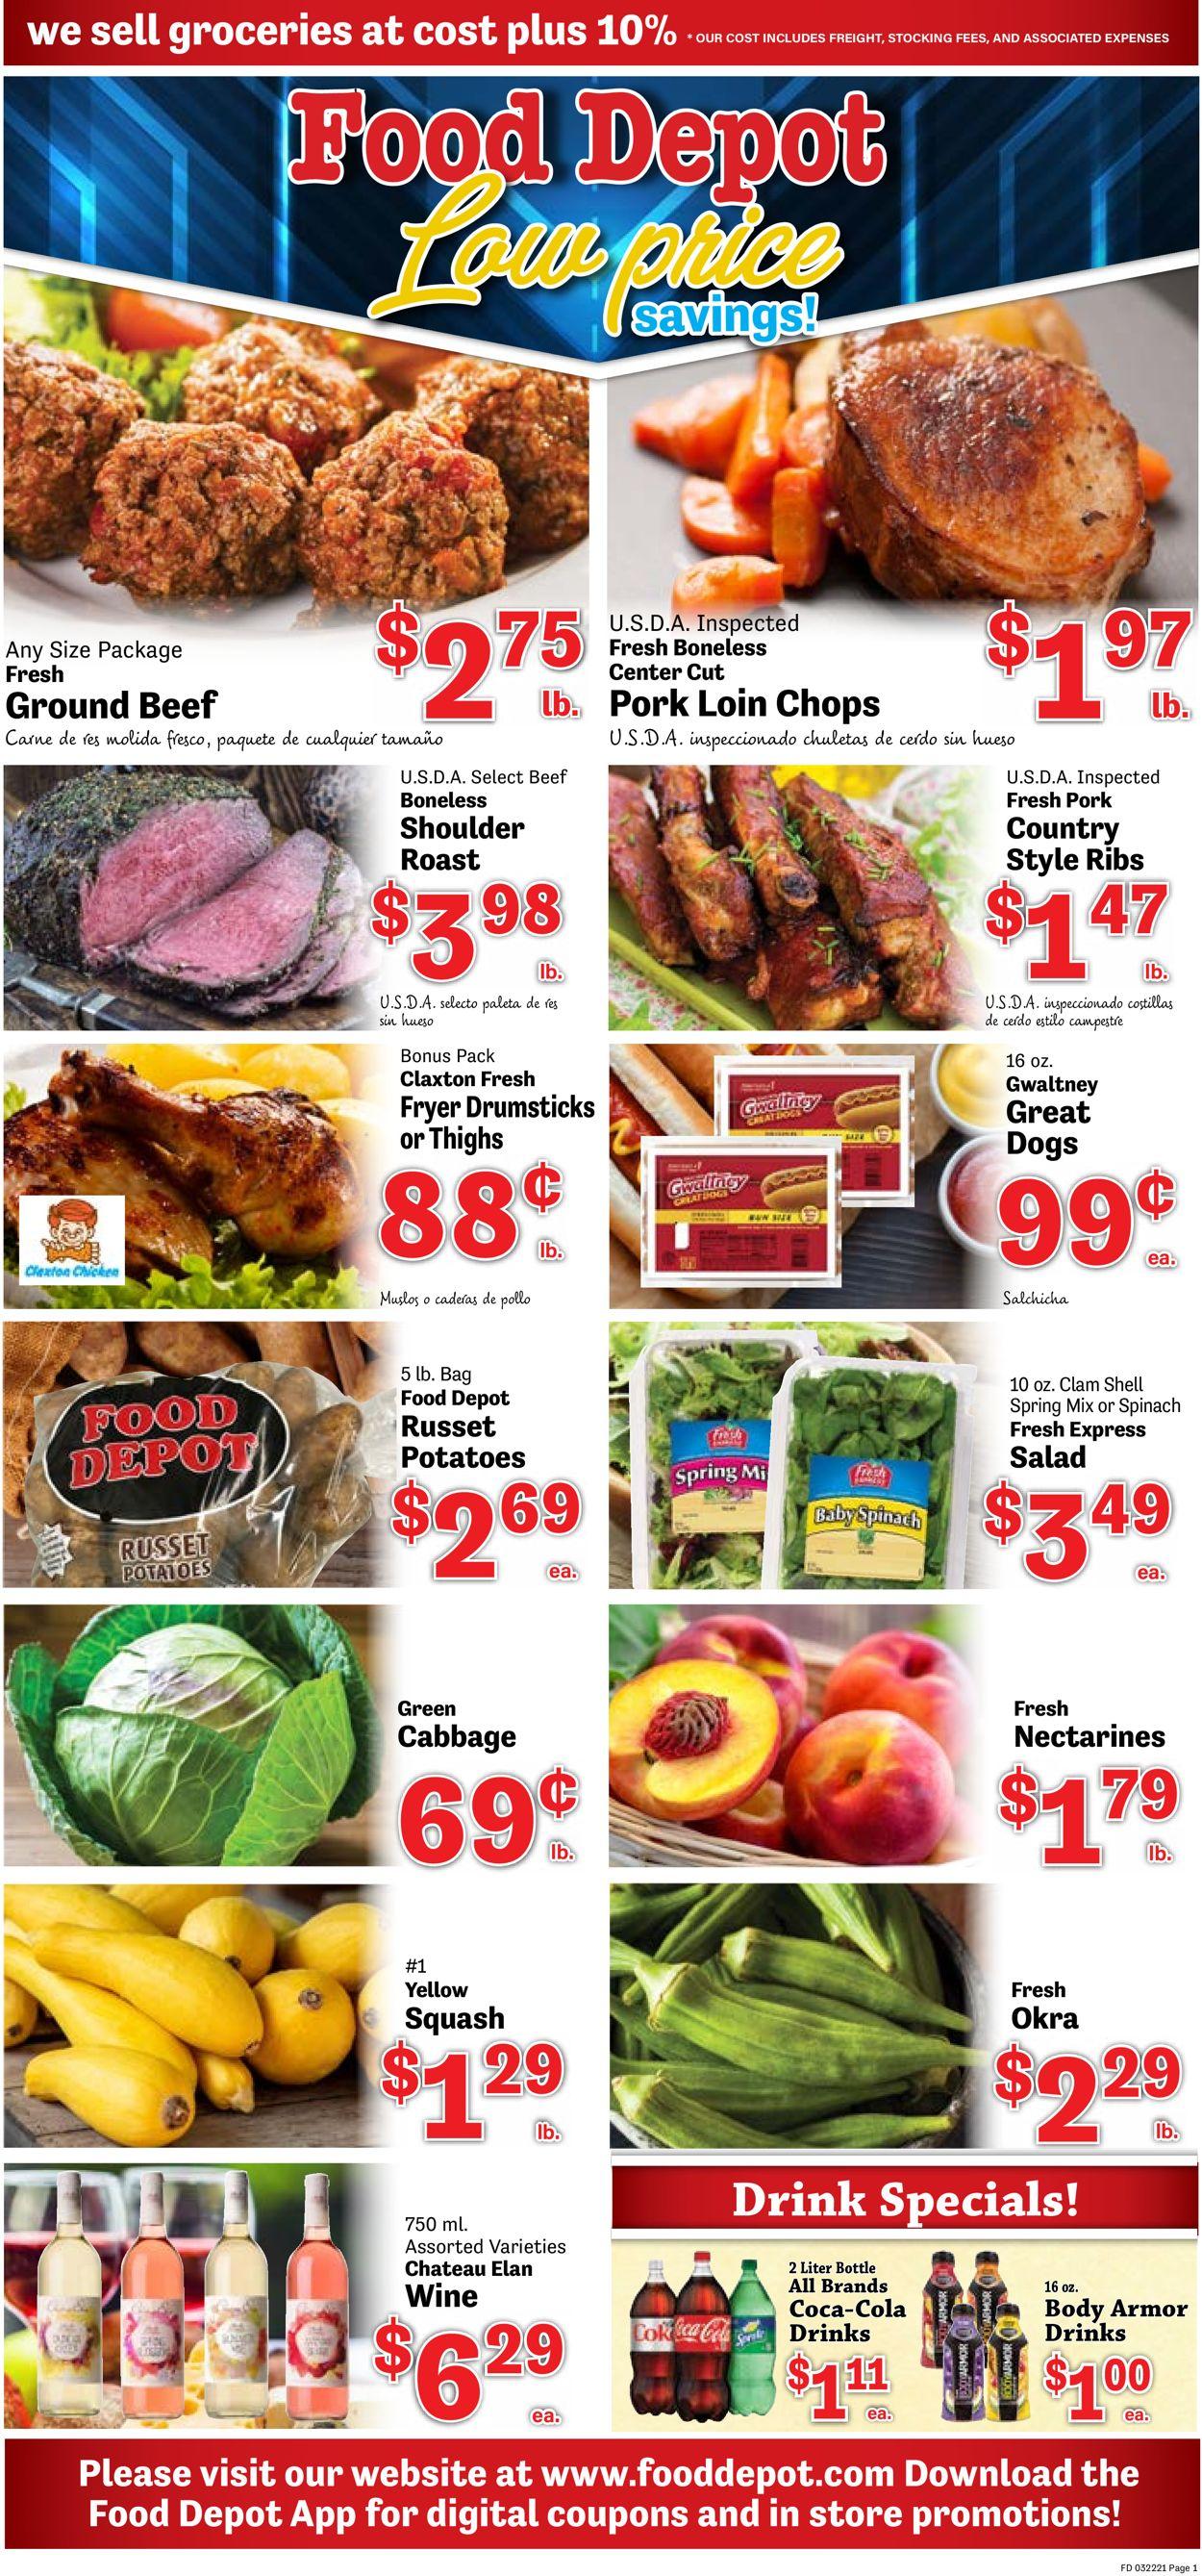 Food Depot Weekly Ad Circular - valid 03/22-03/28/2021